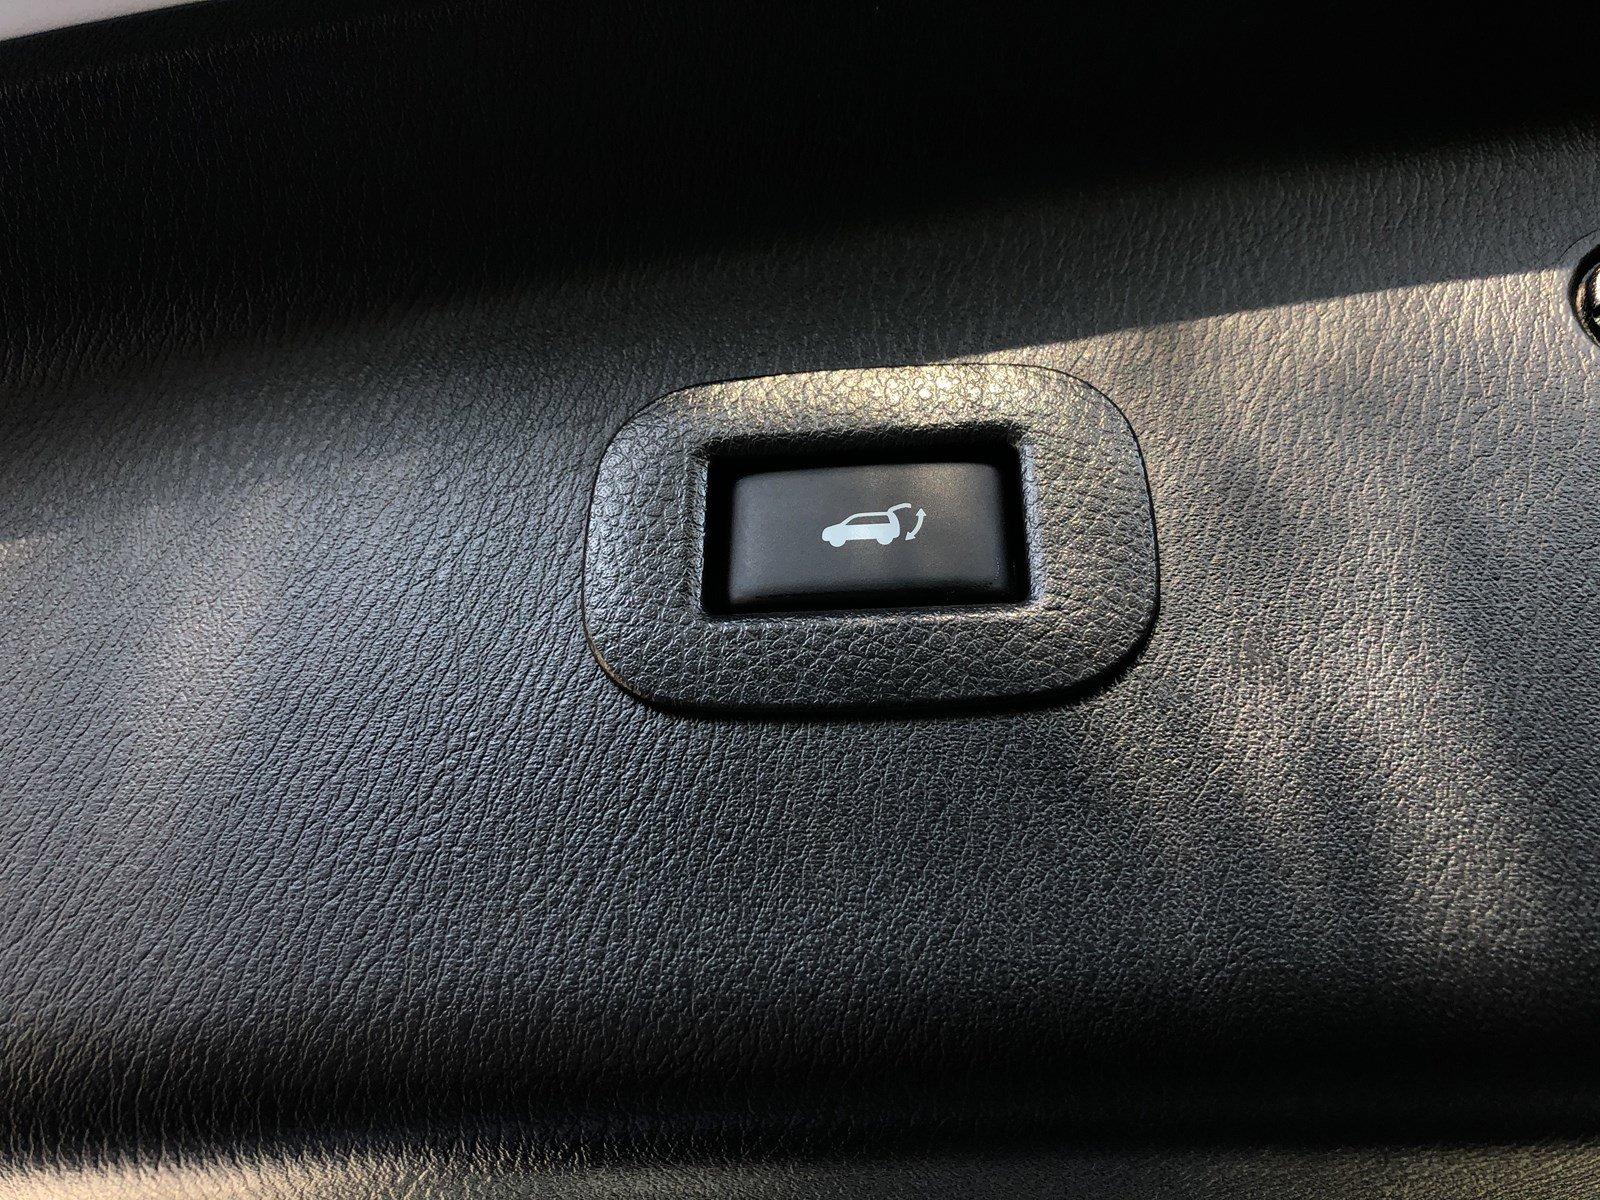 Pre-Owned 2018 INFINITI QX80 RWD